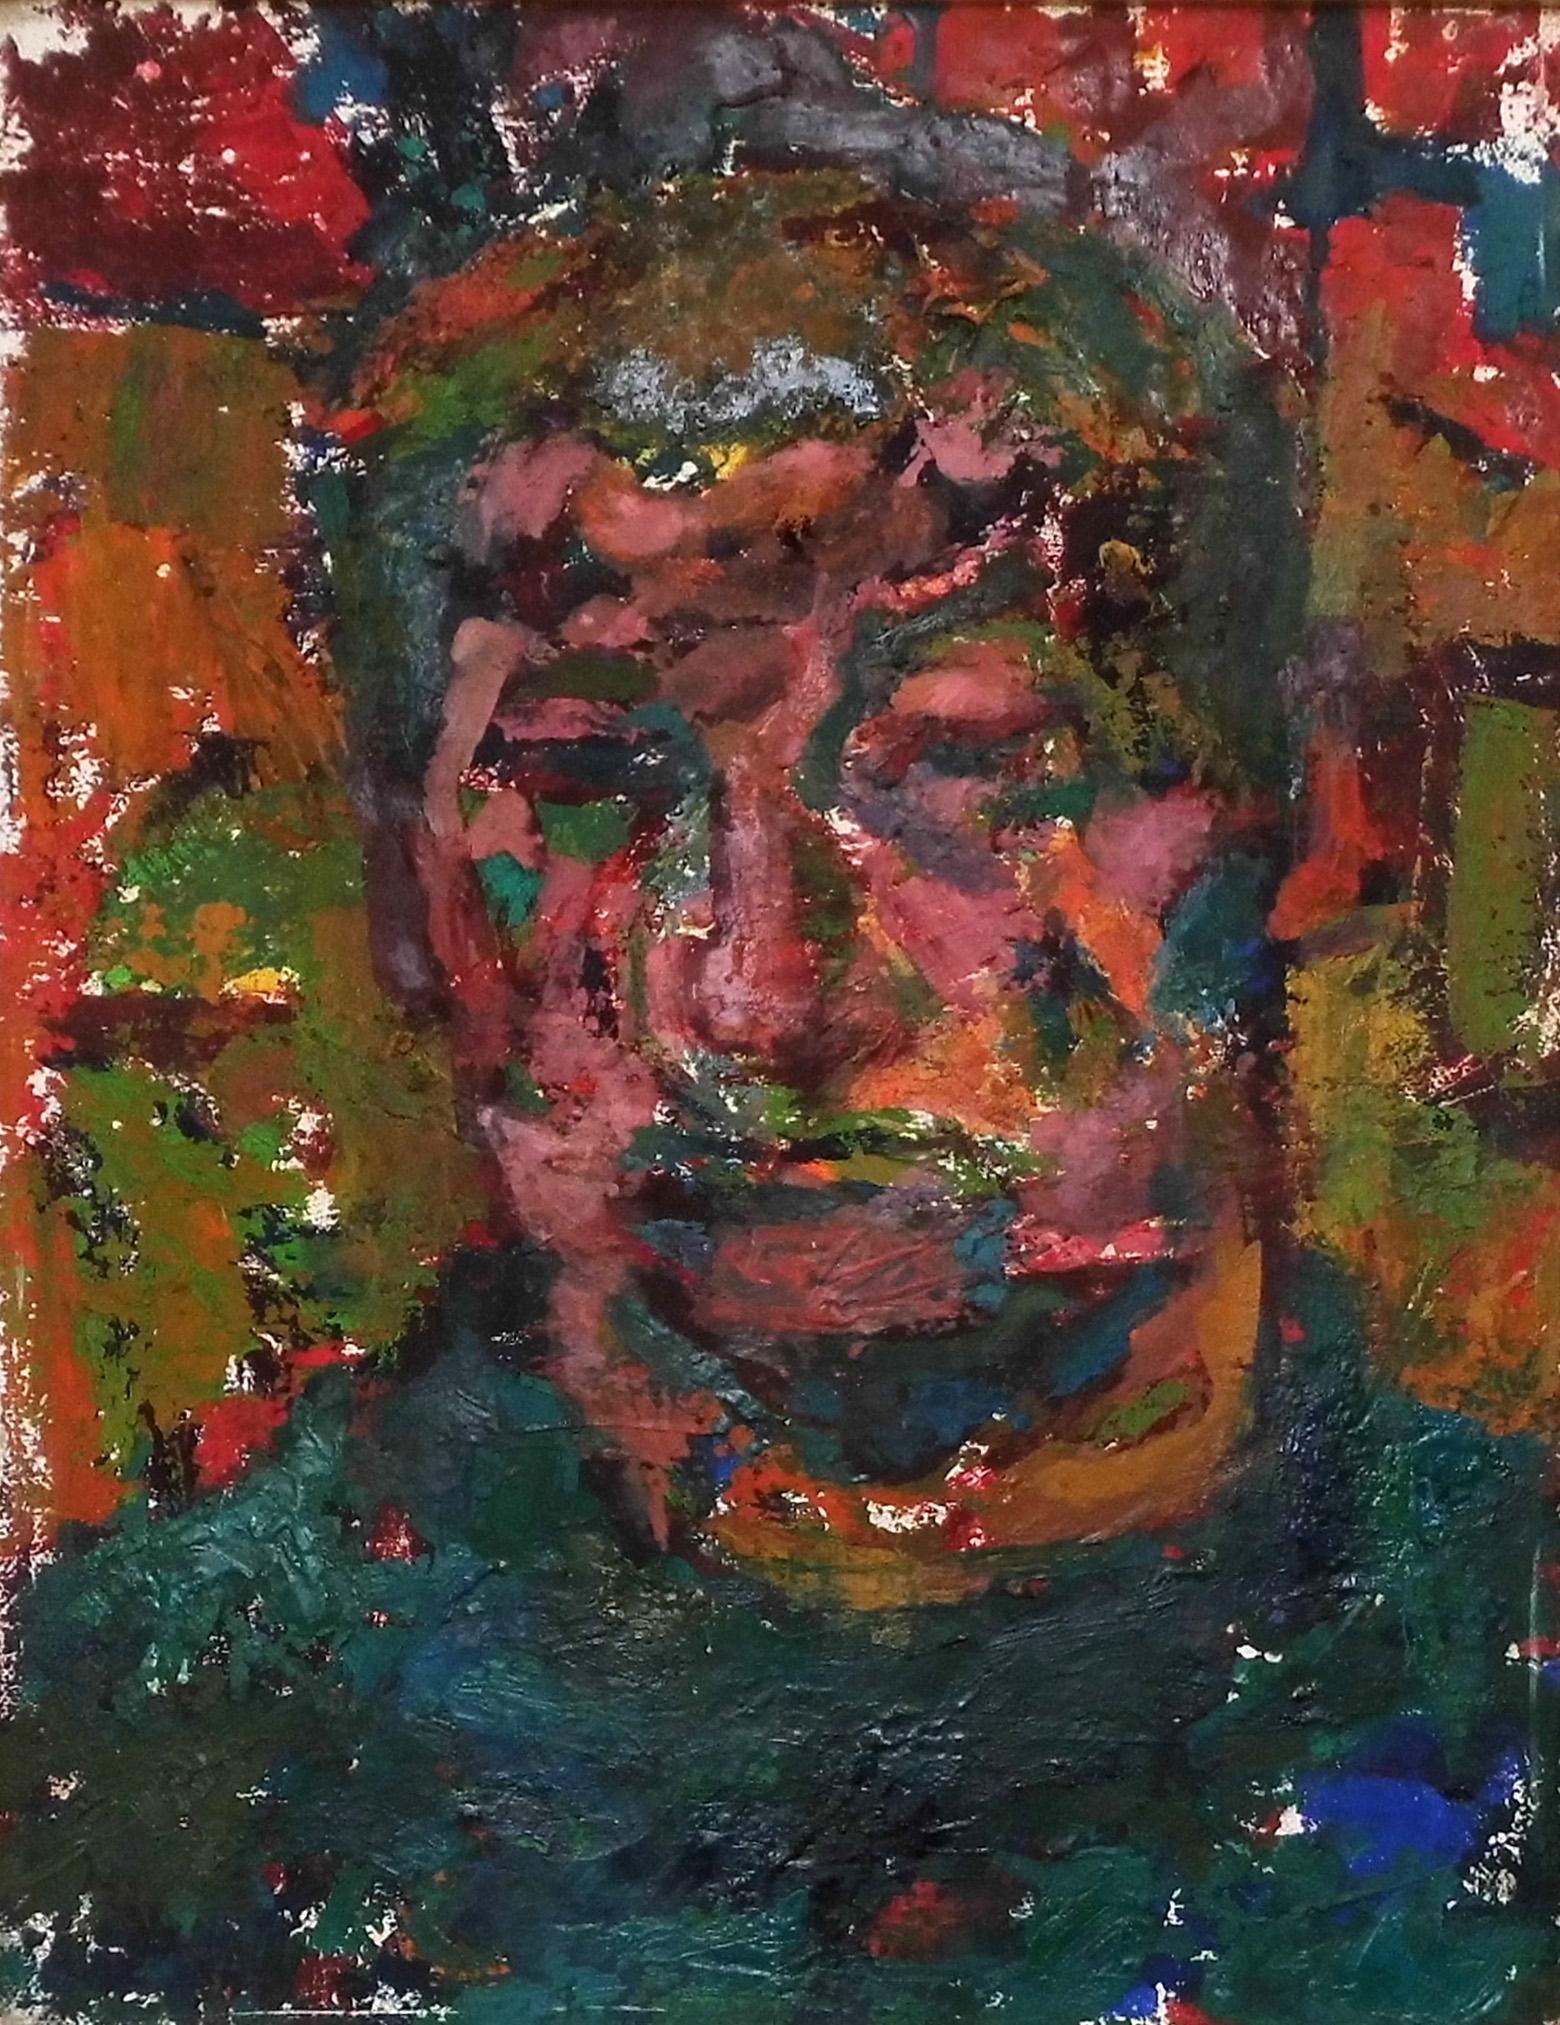 01-Ursula Rzodeczko-Bildnis Gerhard Kettner-1966-Öl auf Leinwand-45x35